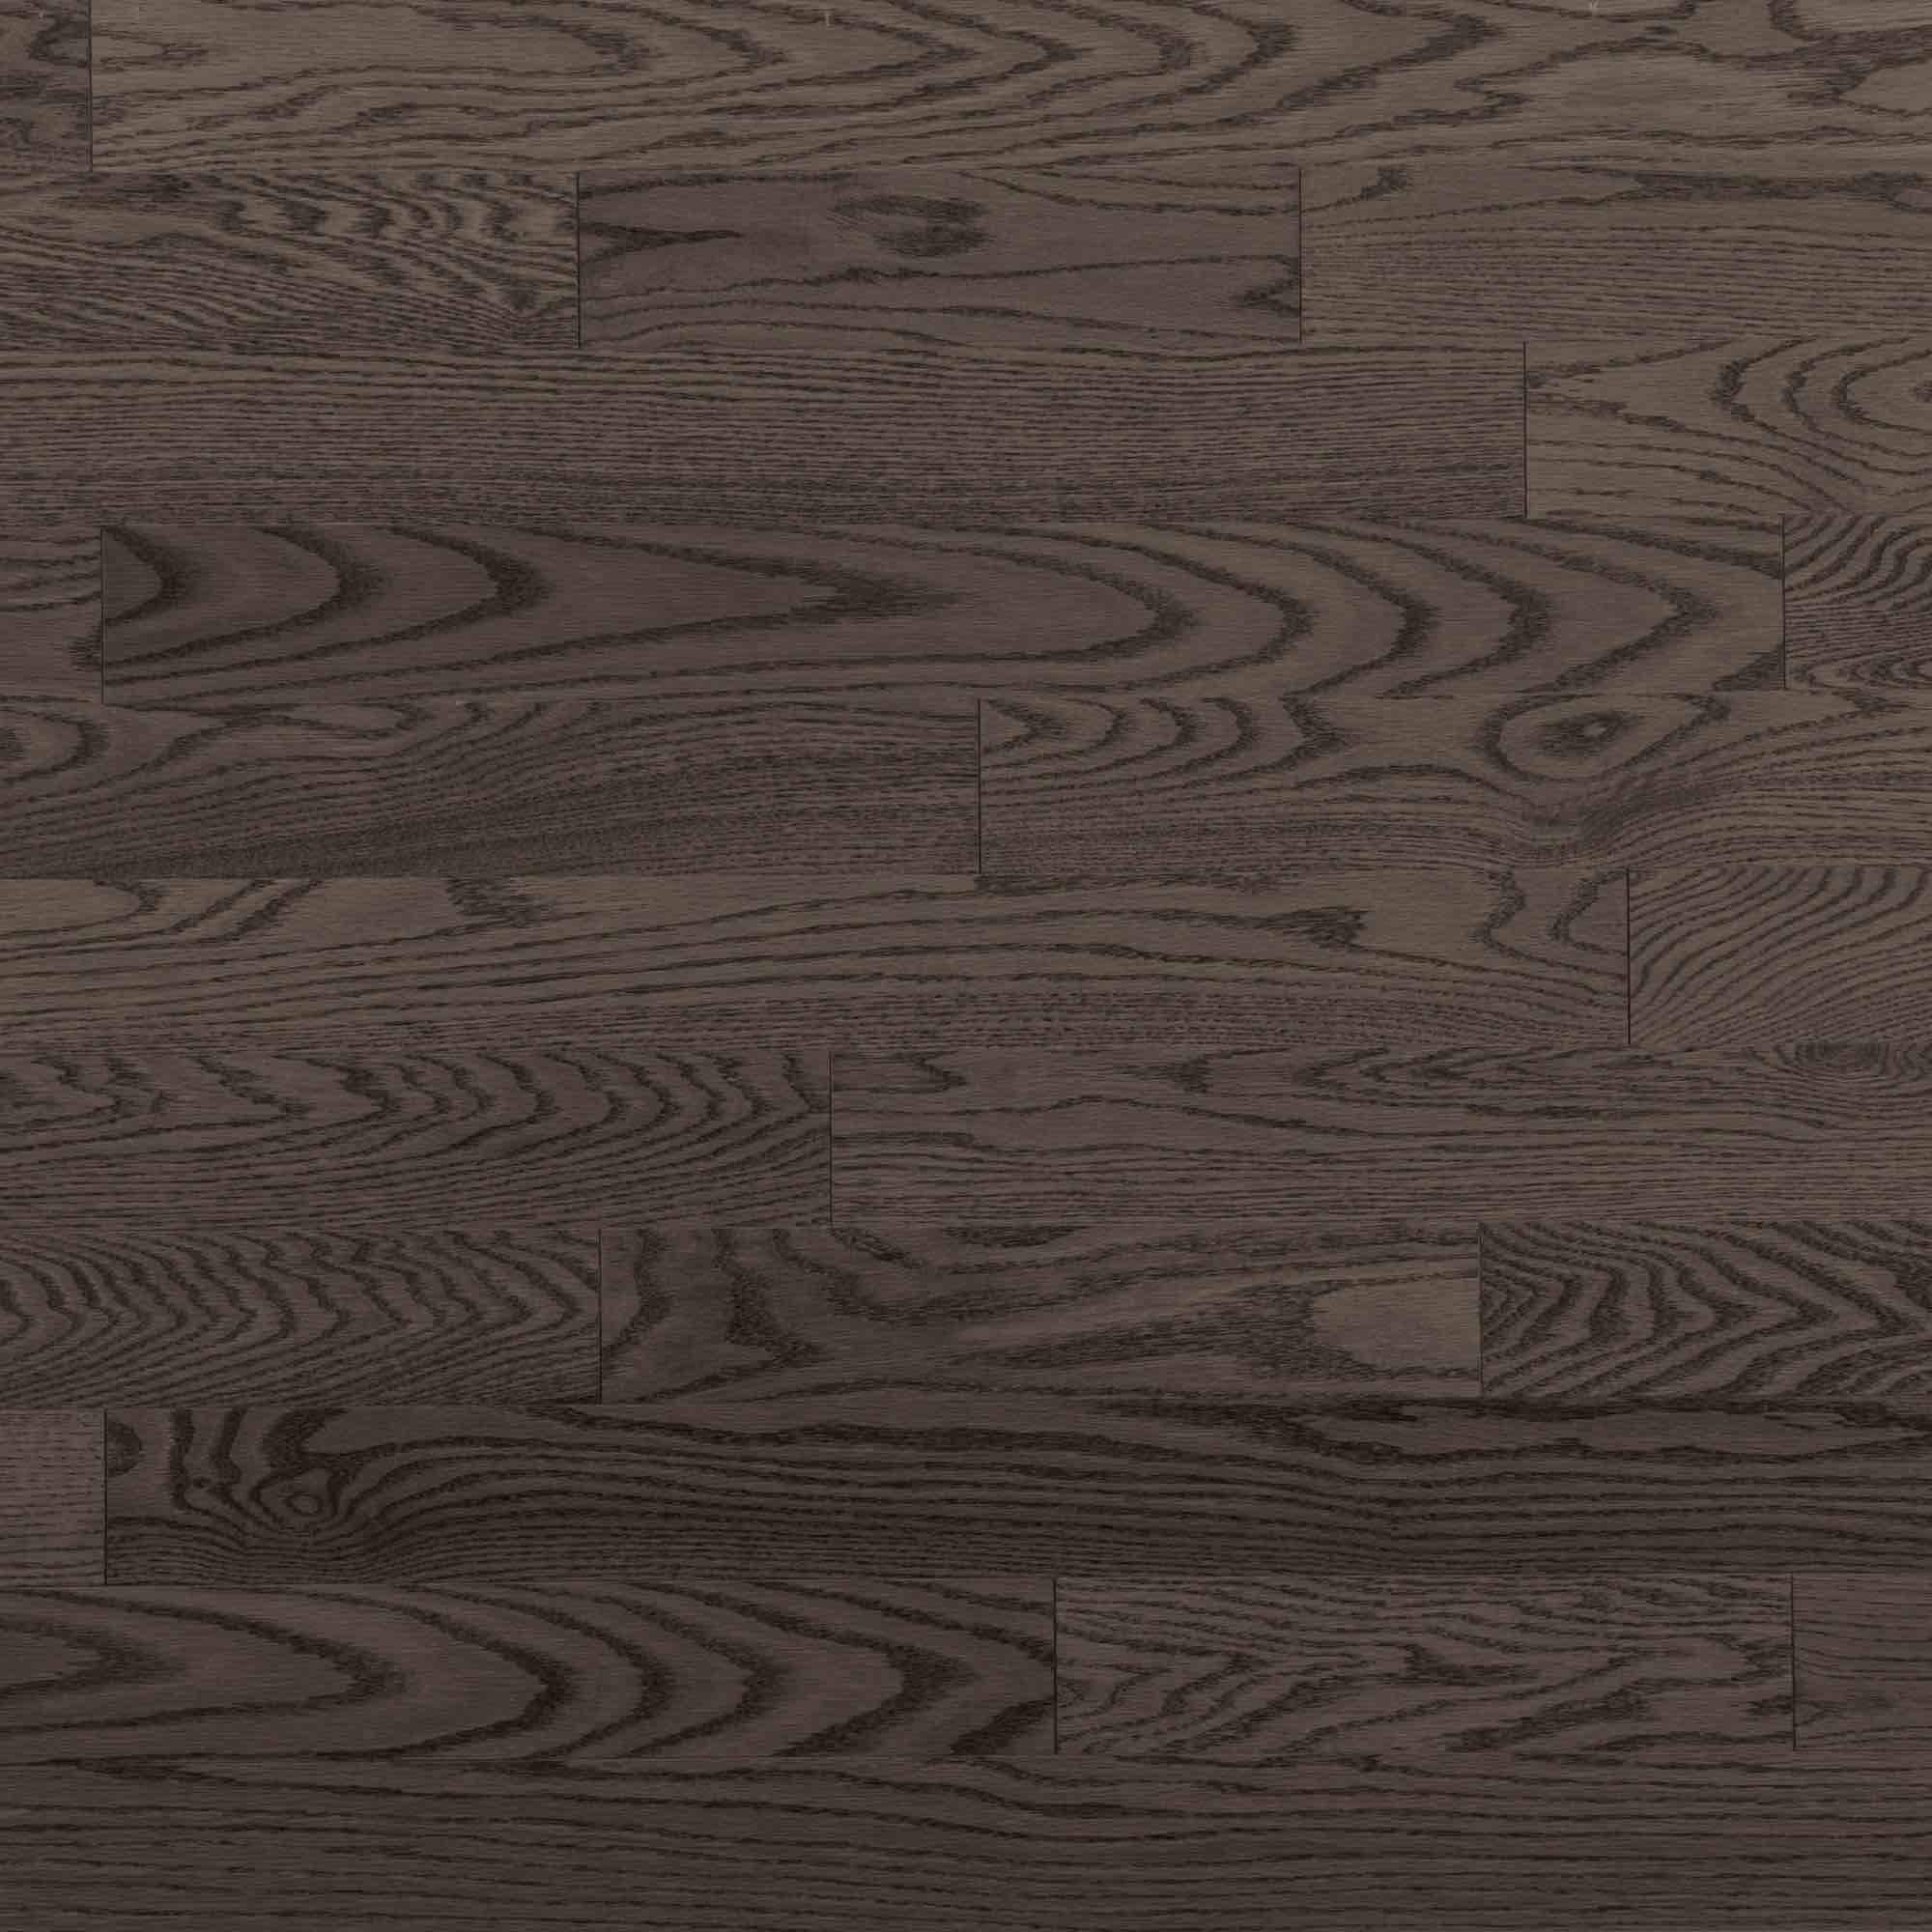 hardwood floor colors lowes of hardwood westfloors west vancouver hardwood flooring carpet within featured hardwoods red oak charcoal